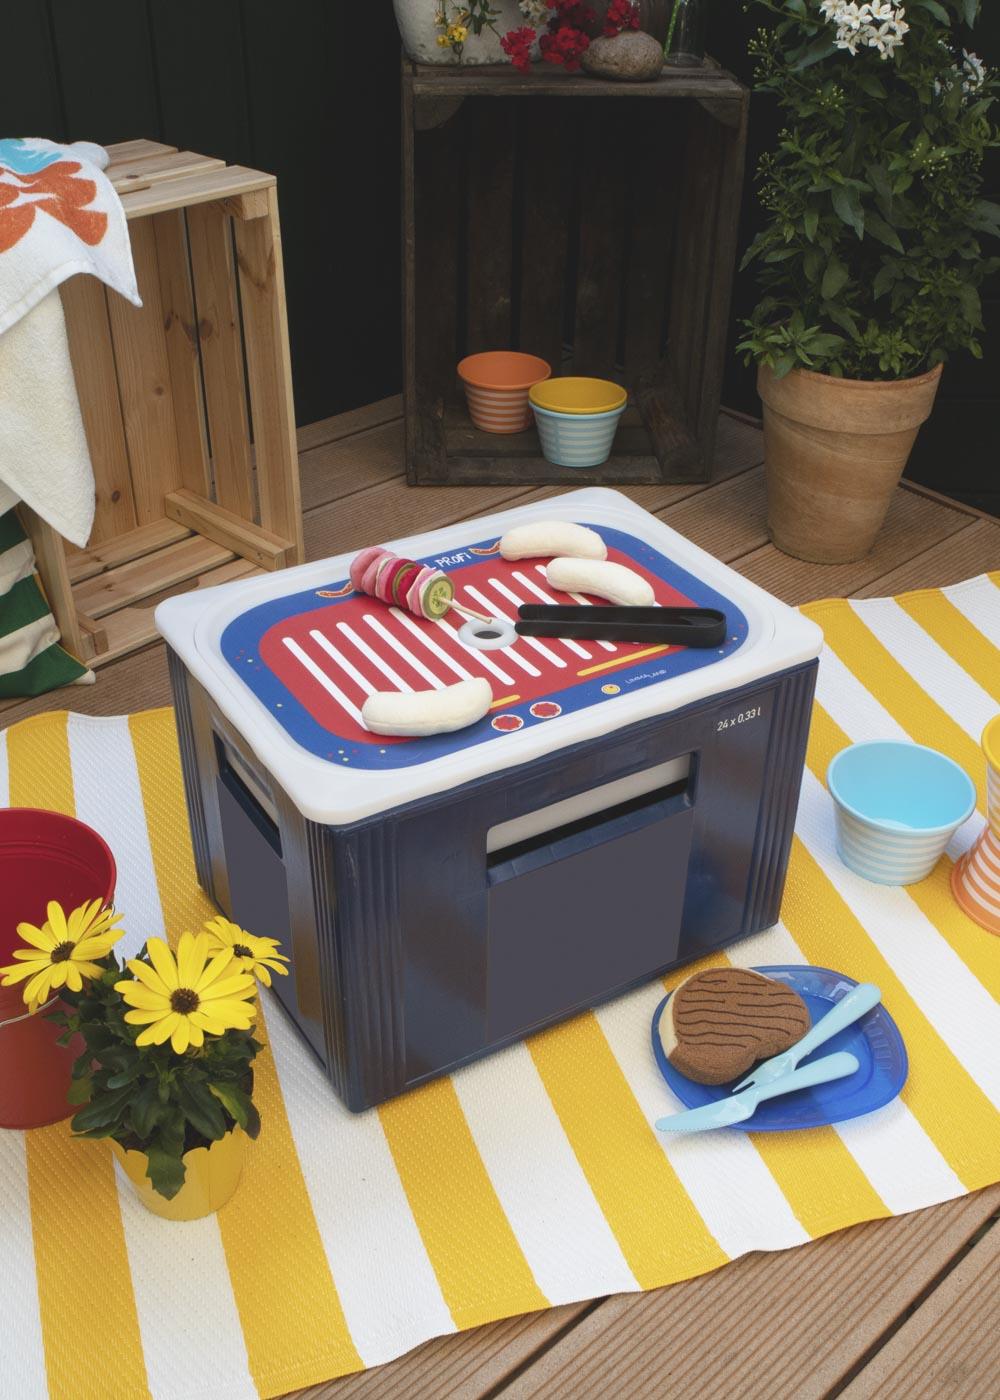 Ikea Trofast Box Kindergrill Feurig rot blau Teilansicht Getränkekasten